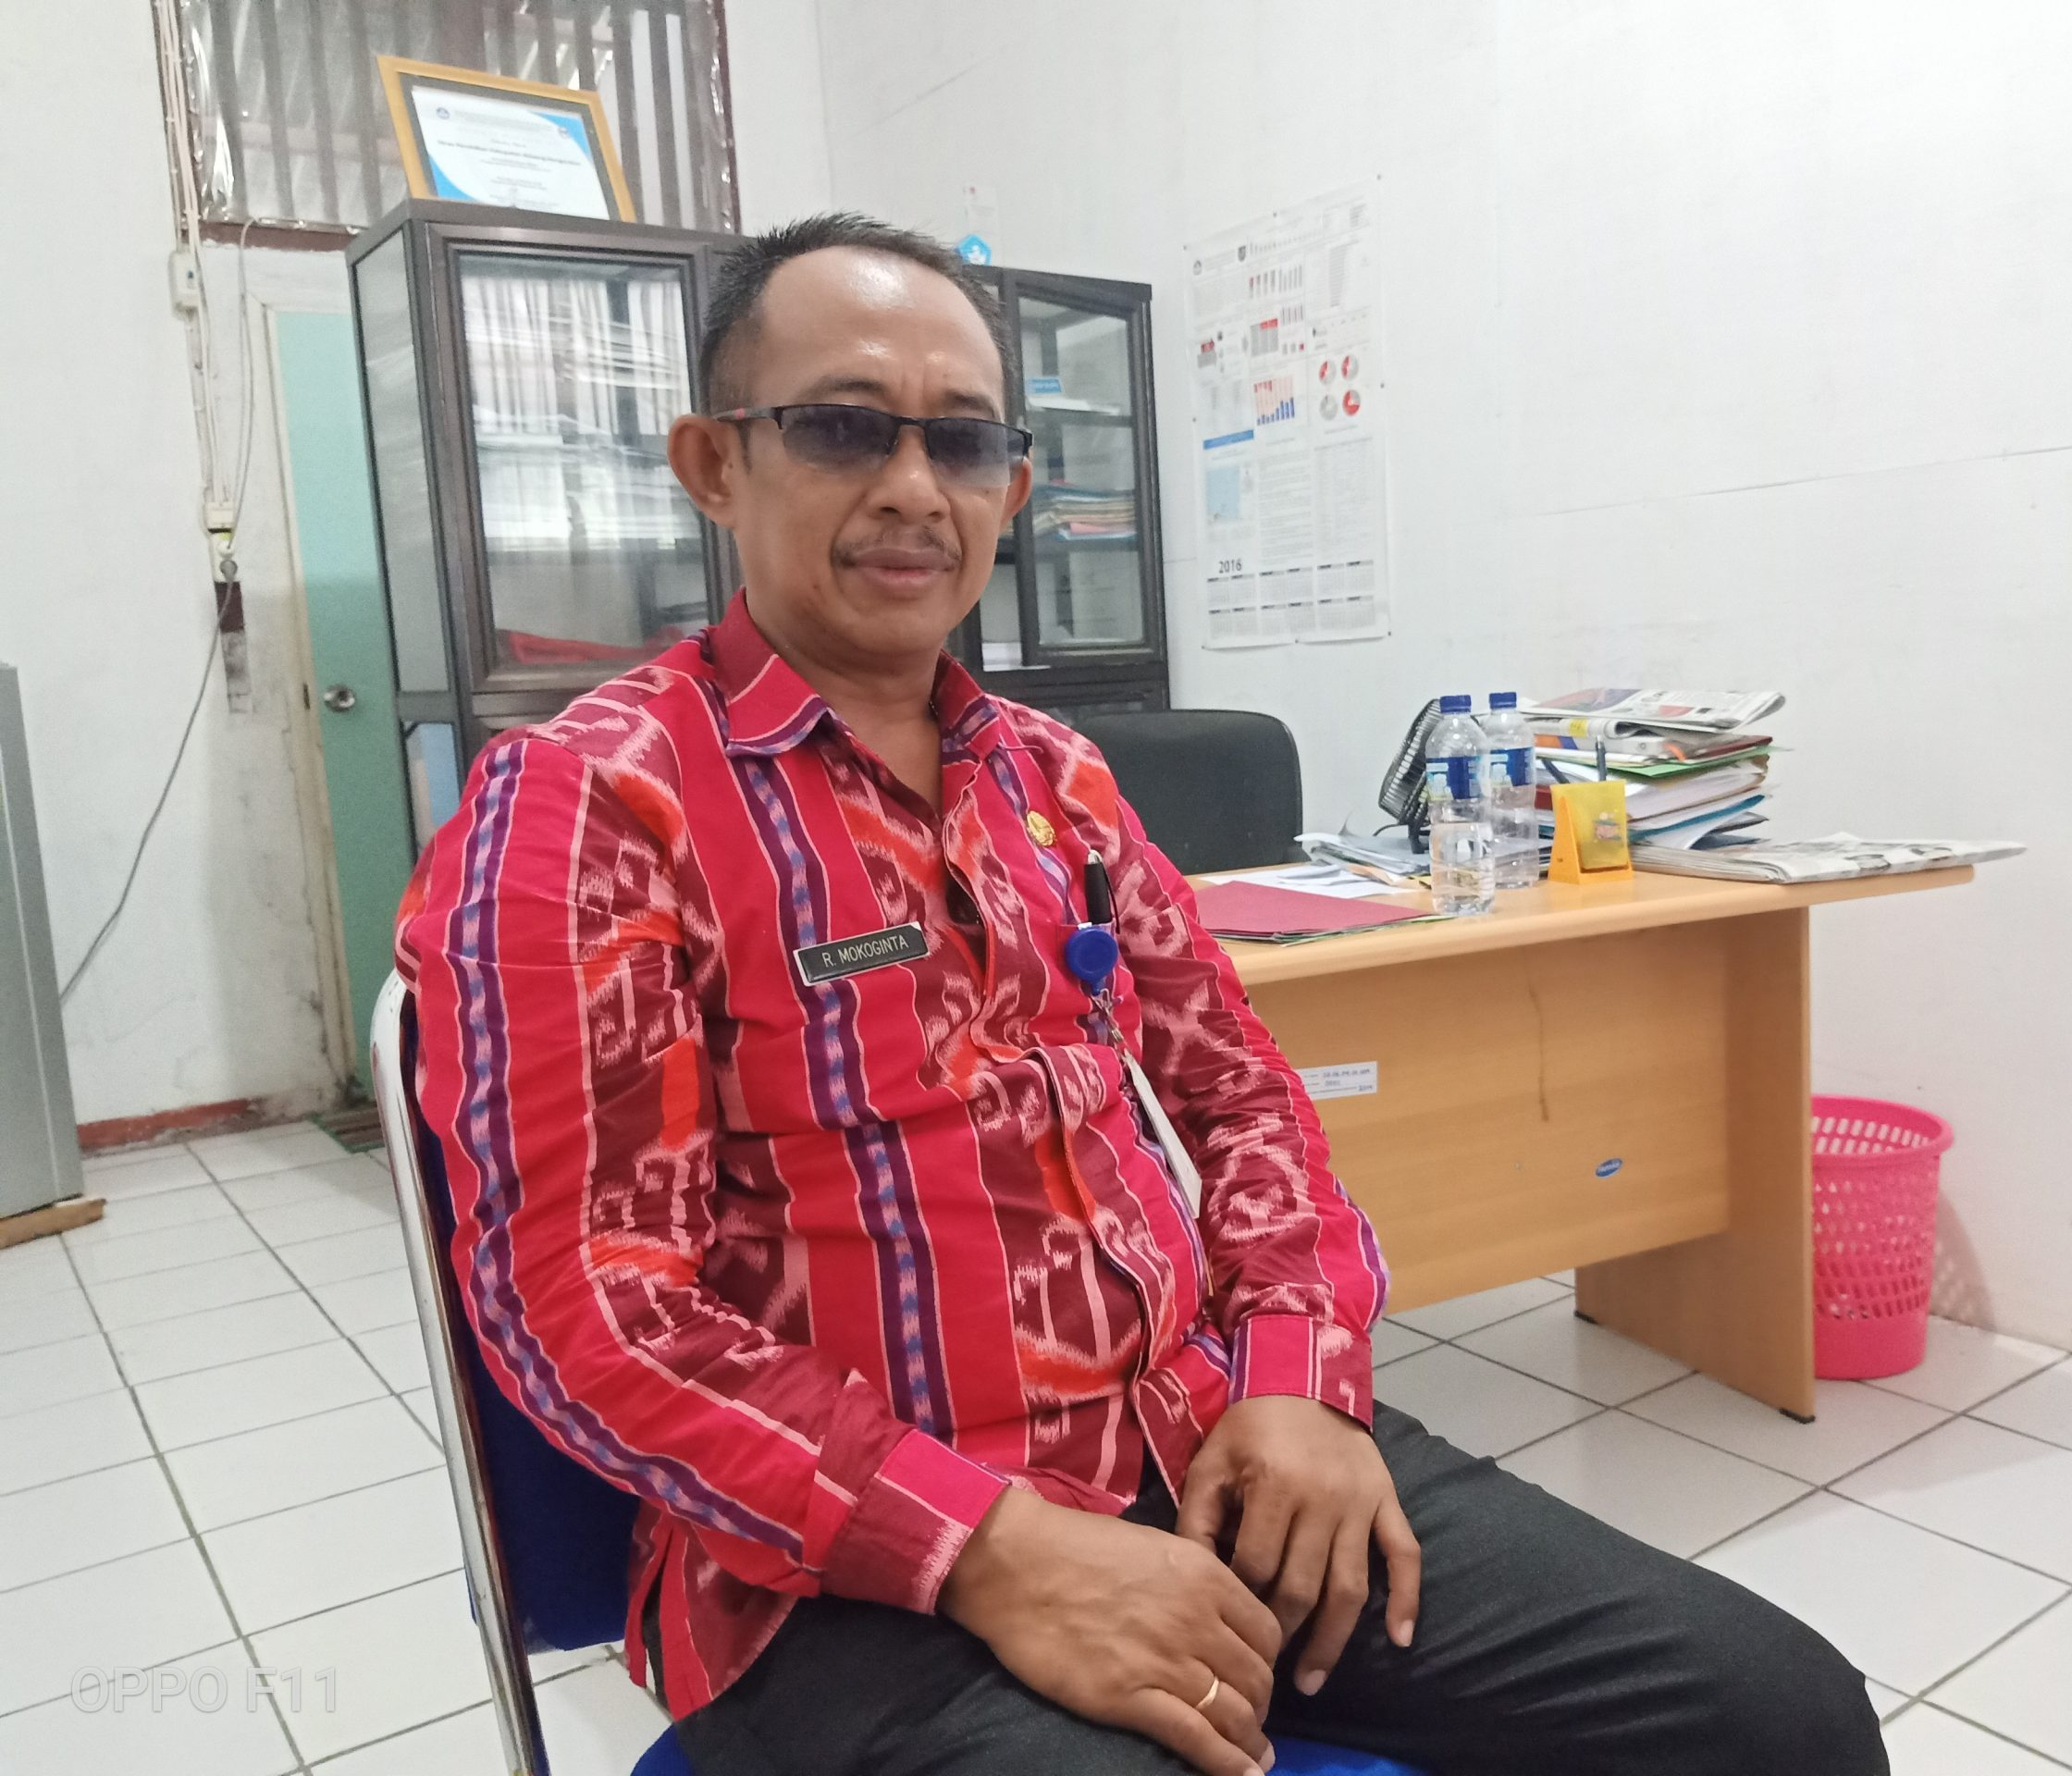 Renti : Penerapan Belajar Mengajar Tatap Muka di Bolmong Masih Menunggu Petunjuk Satgas Penanganan Covid -19